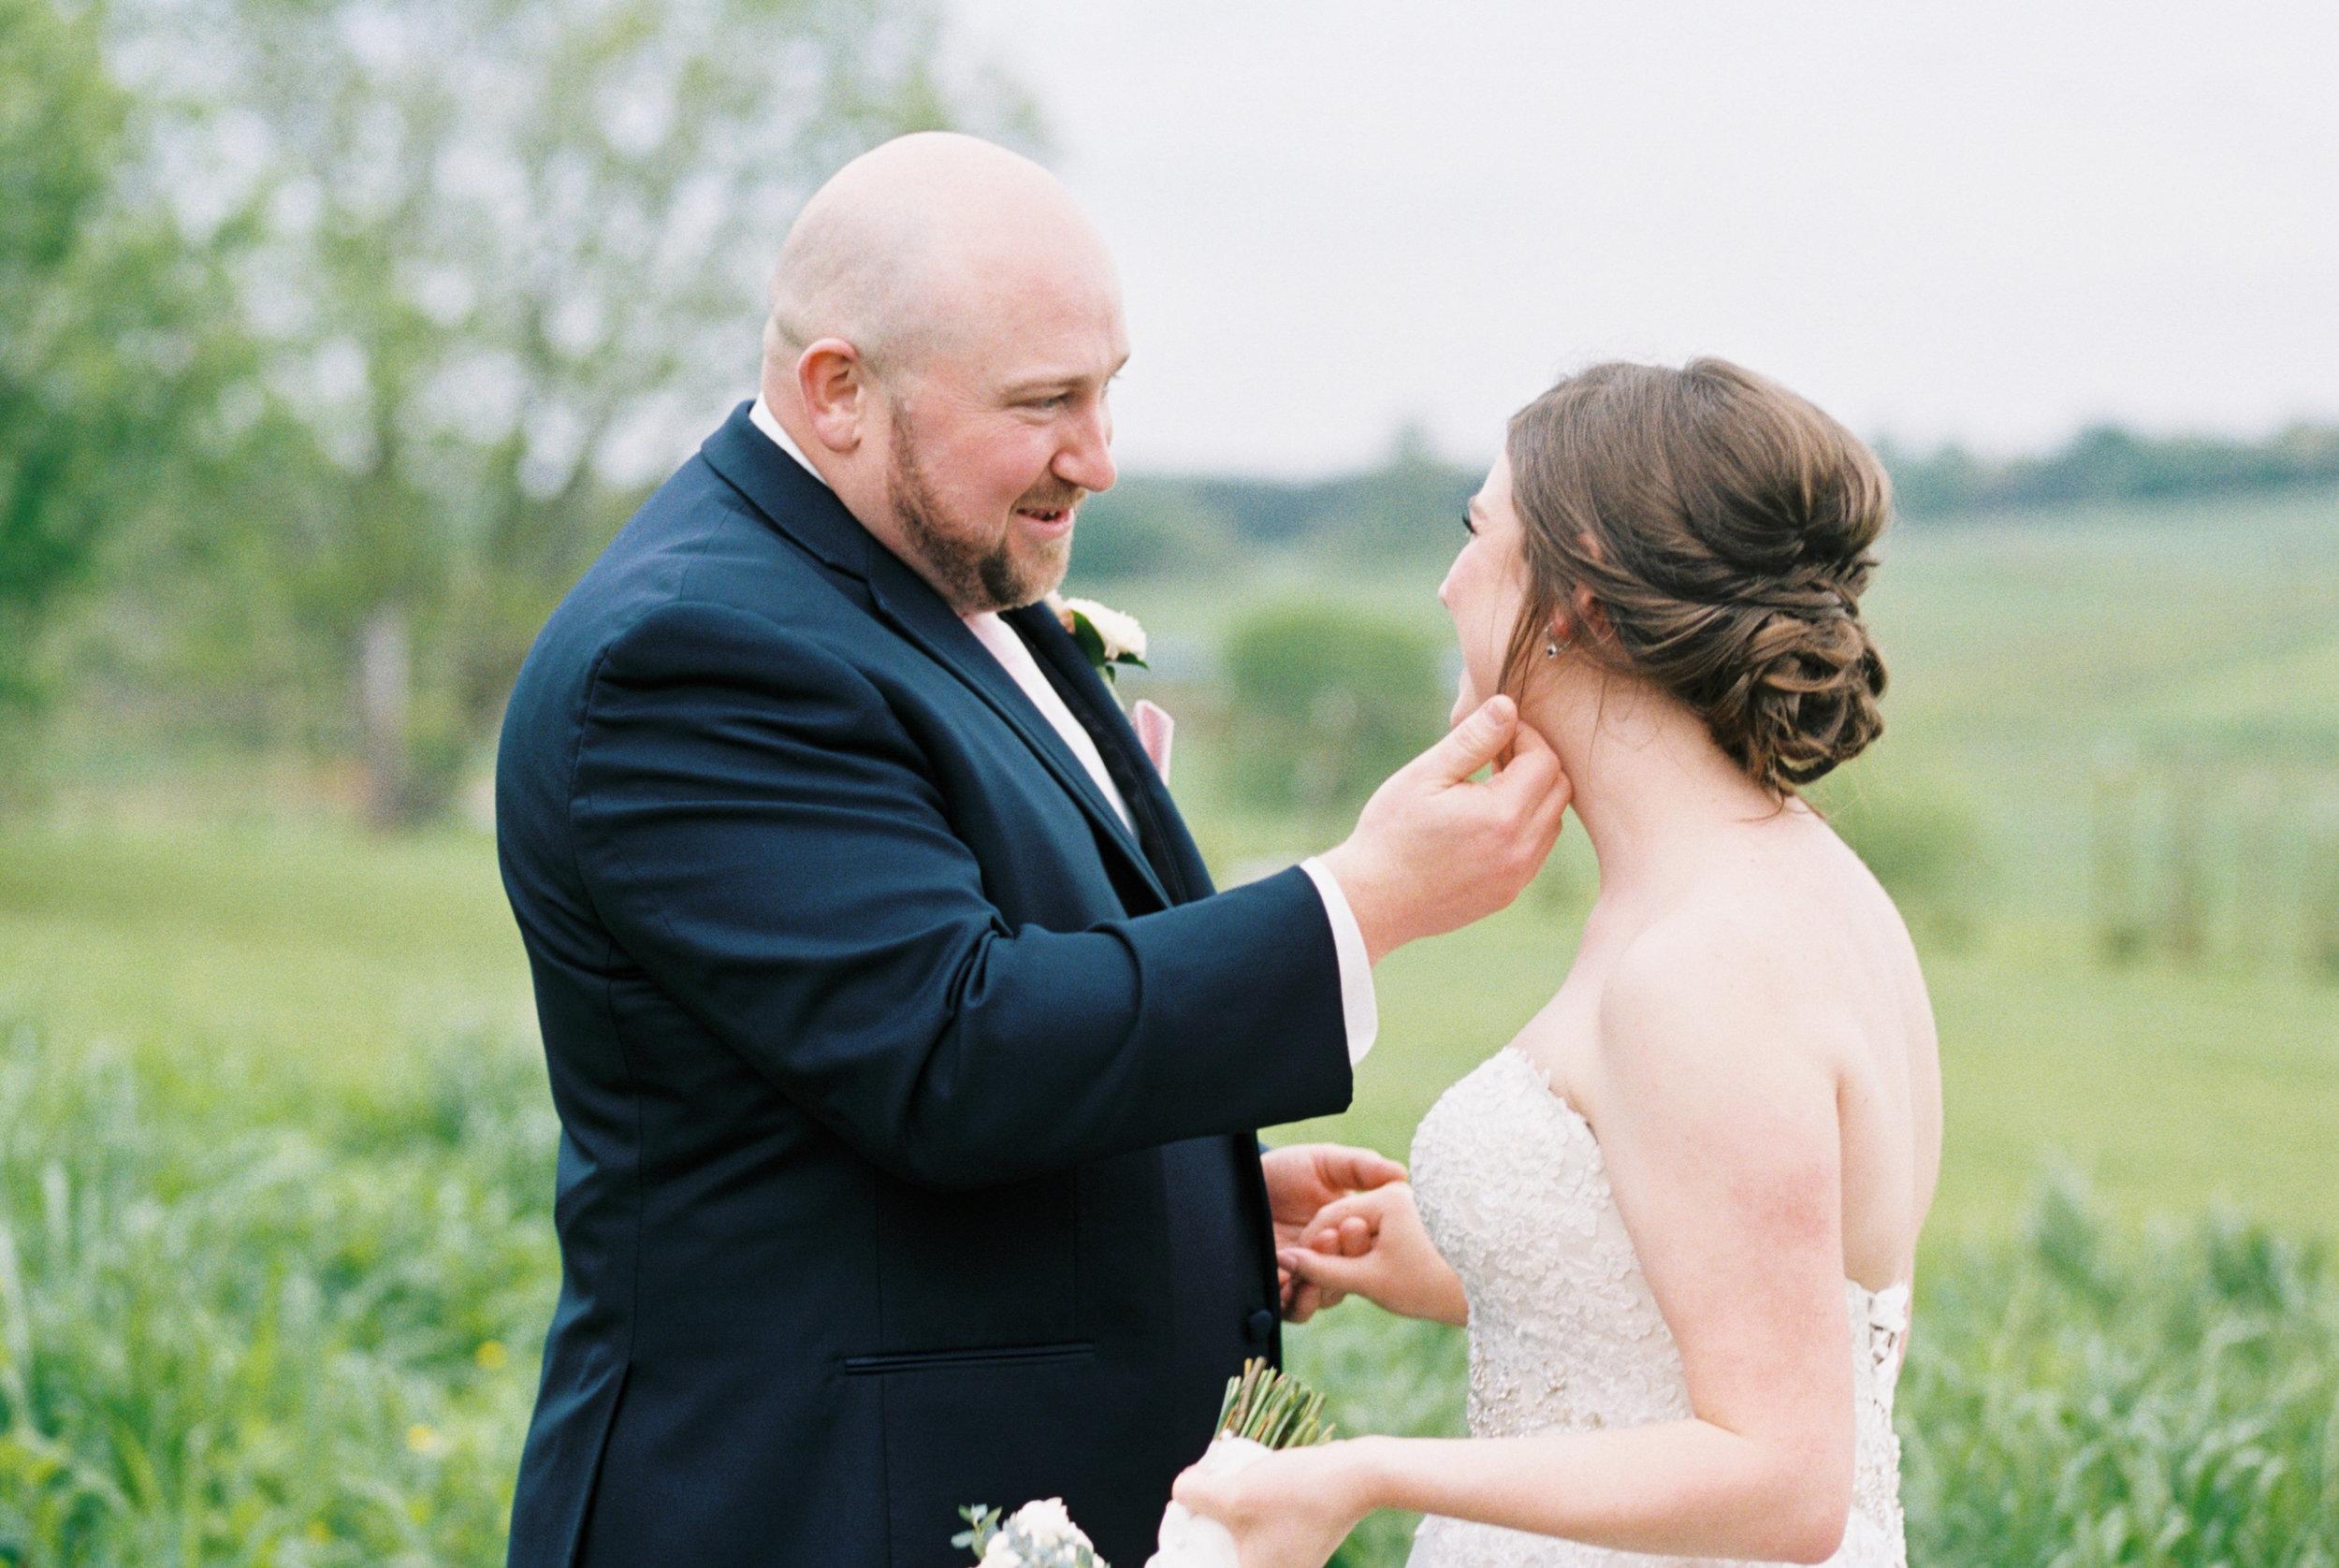 Lydia_johnathan_Wedding_Abigail_Malone_Photography-204.jpg